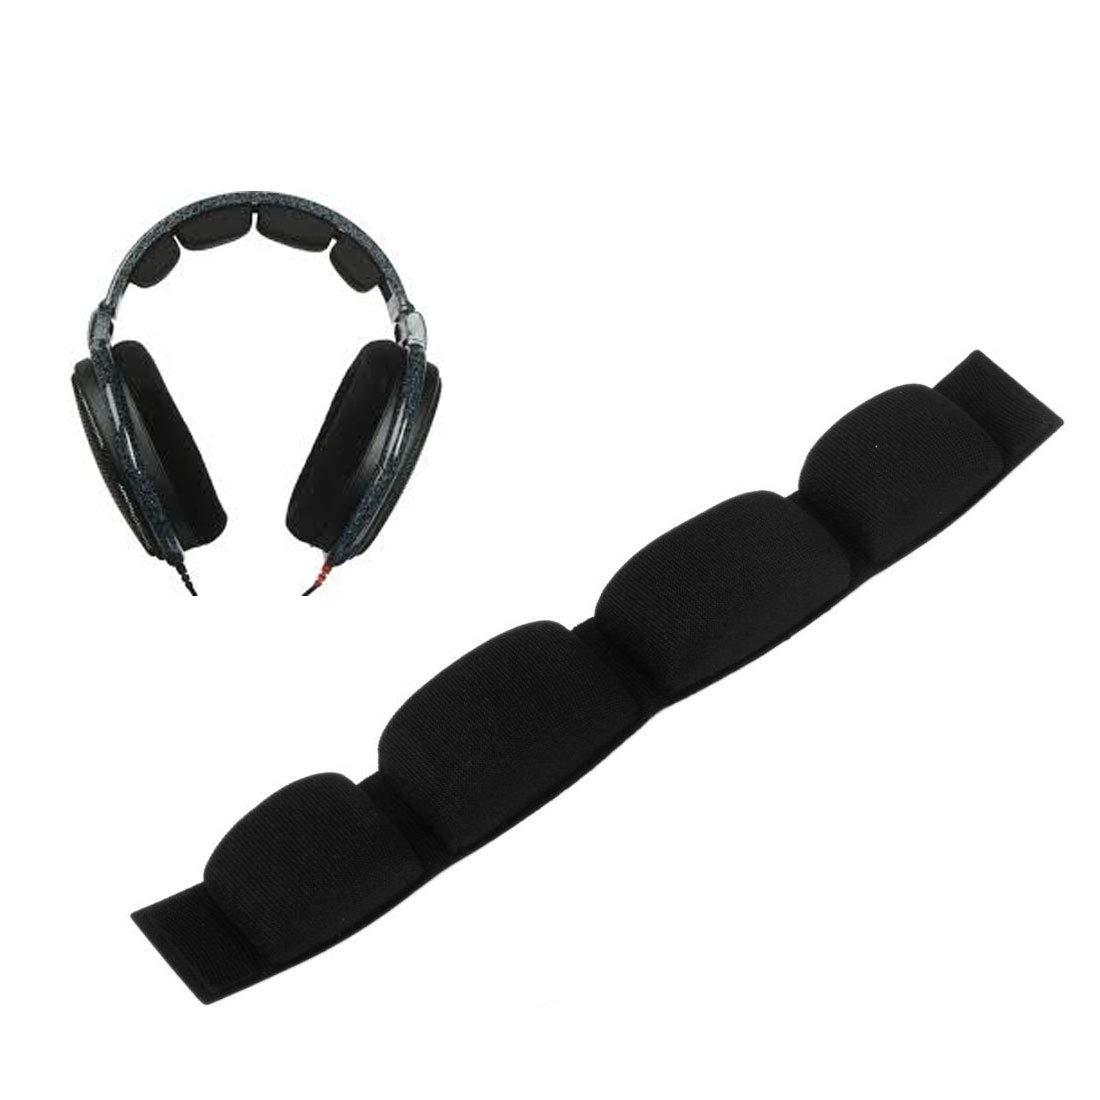 Yoozalo 交換用ヘッドバンドクッションパッド - Sennheiser HD650 HD600 HD580 HD545 ヘッドフォン用 (ブラック、ベロア) B07NNLZY7K